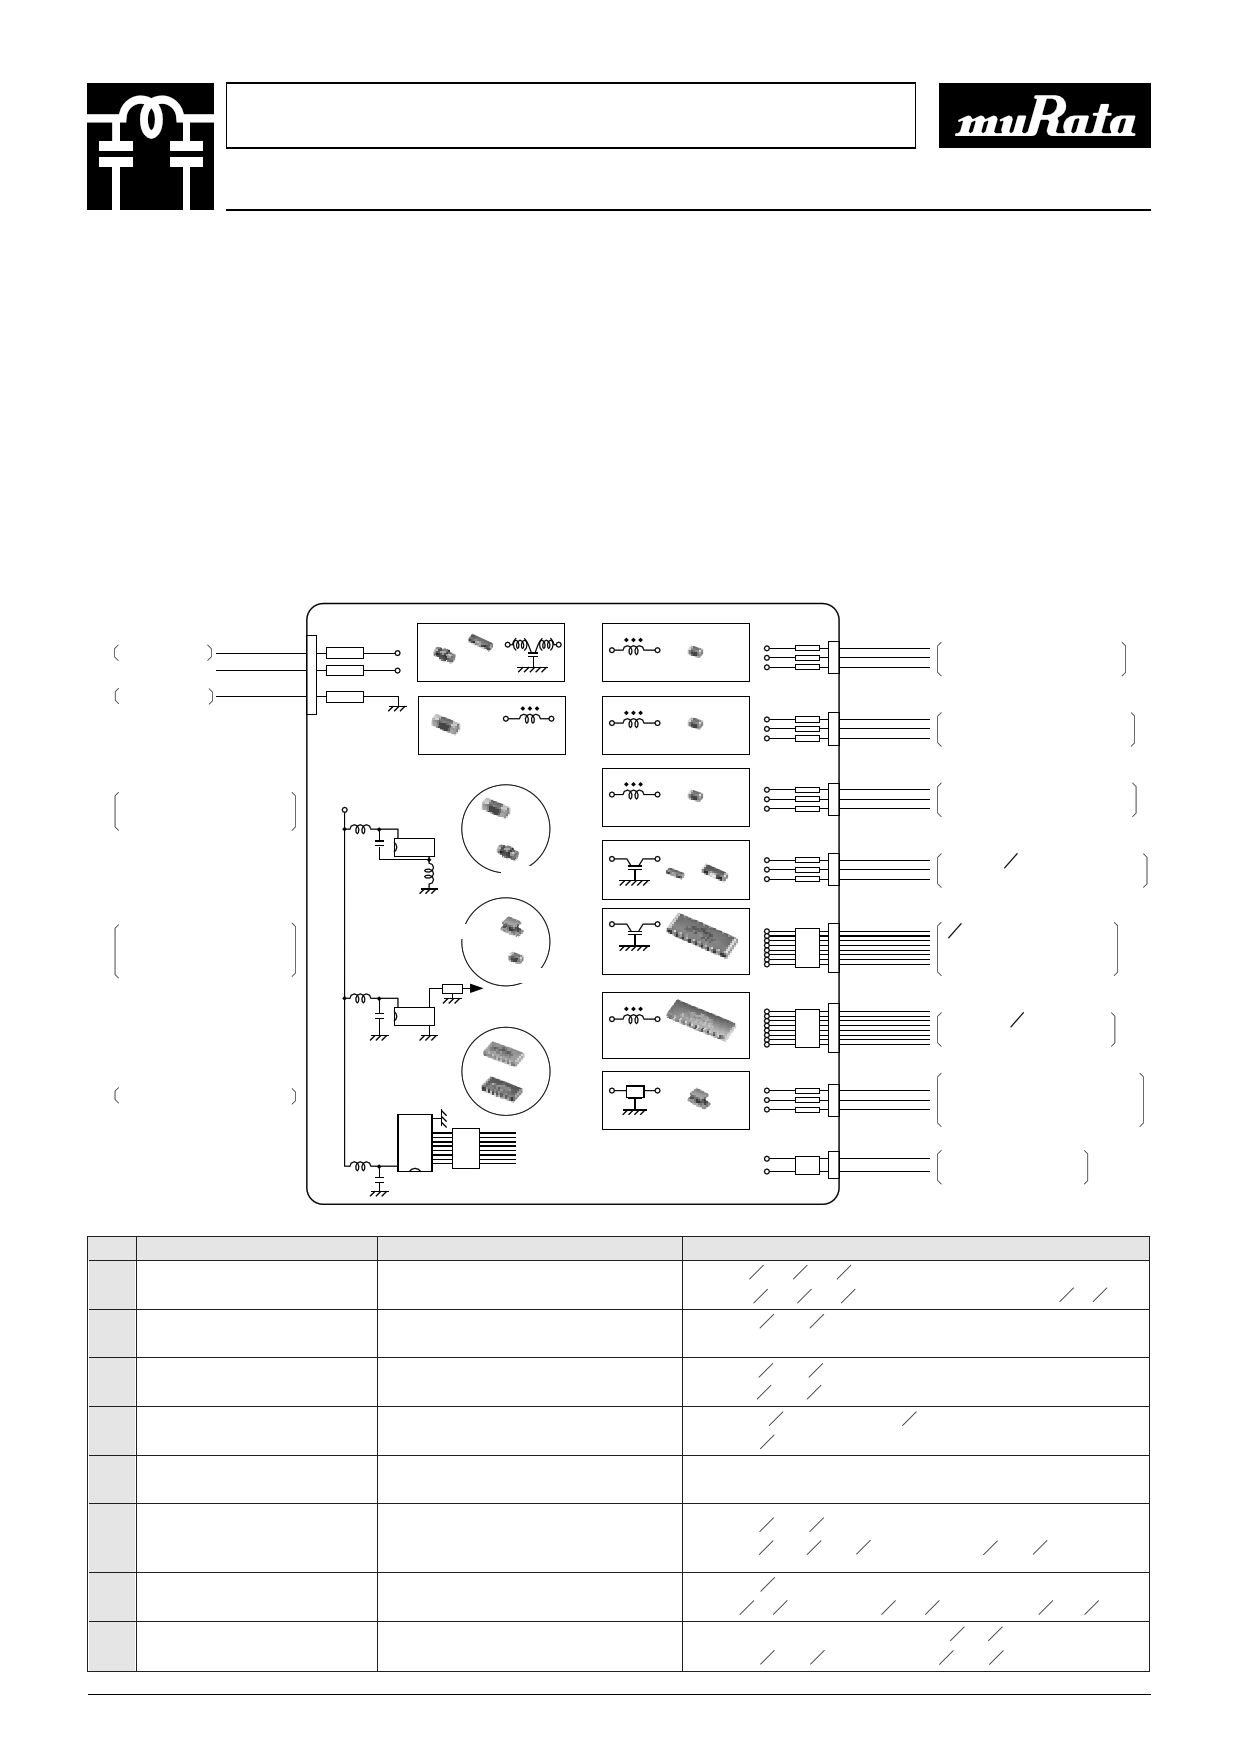 NFM41R11C222 pdf schematic